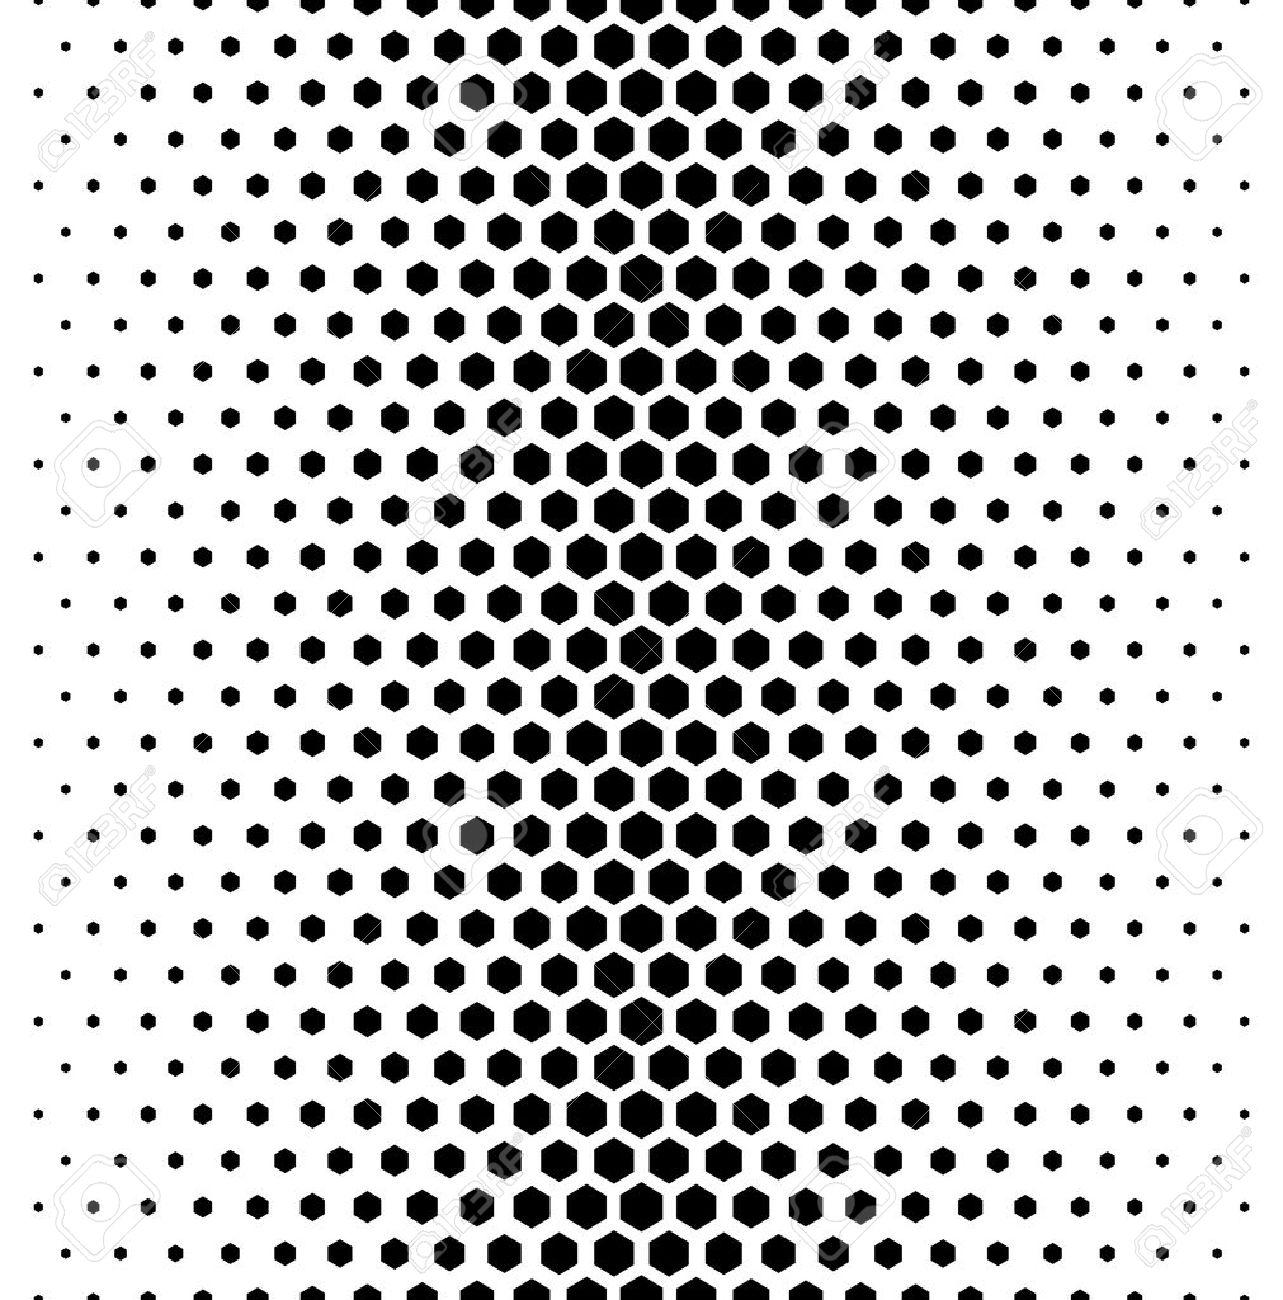 Vector modern tiles pattern. Abstract gradient op art seamless monochrome background with hexagon - 45352207